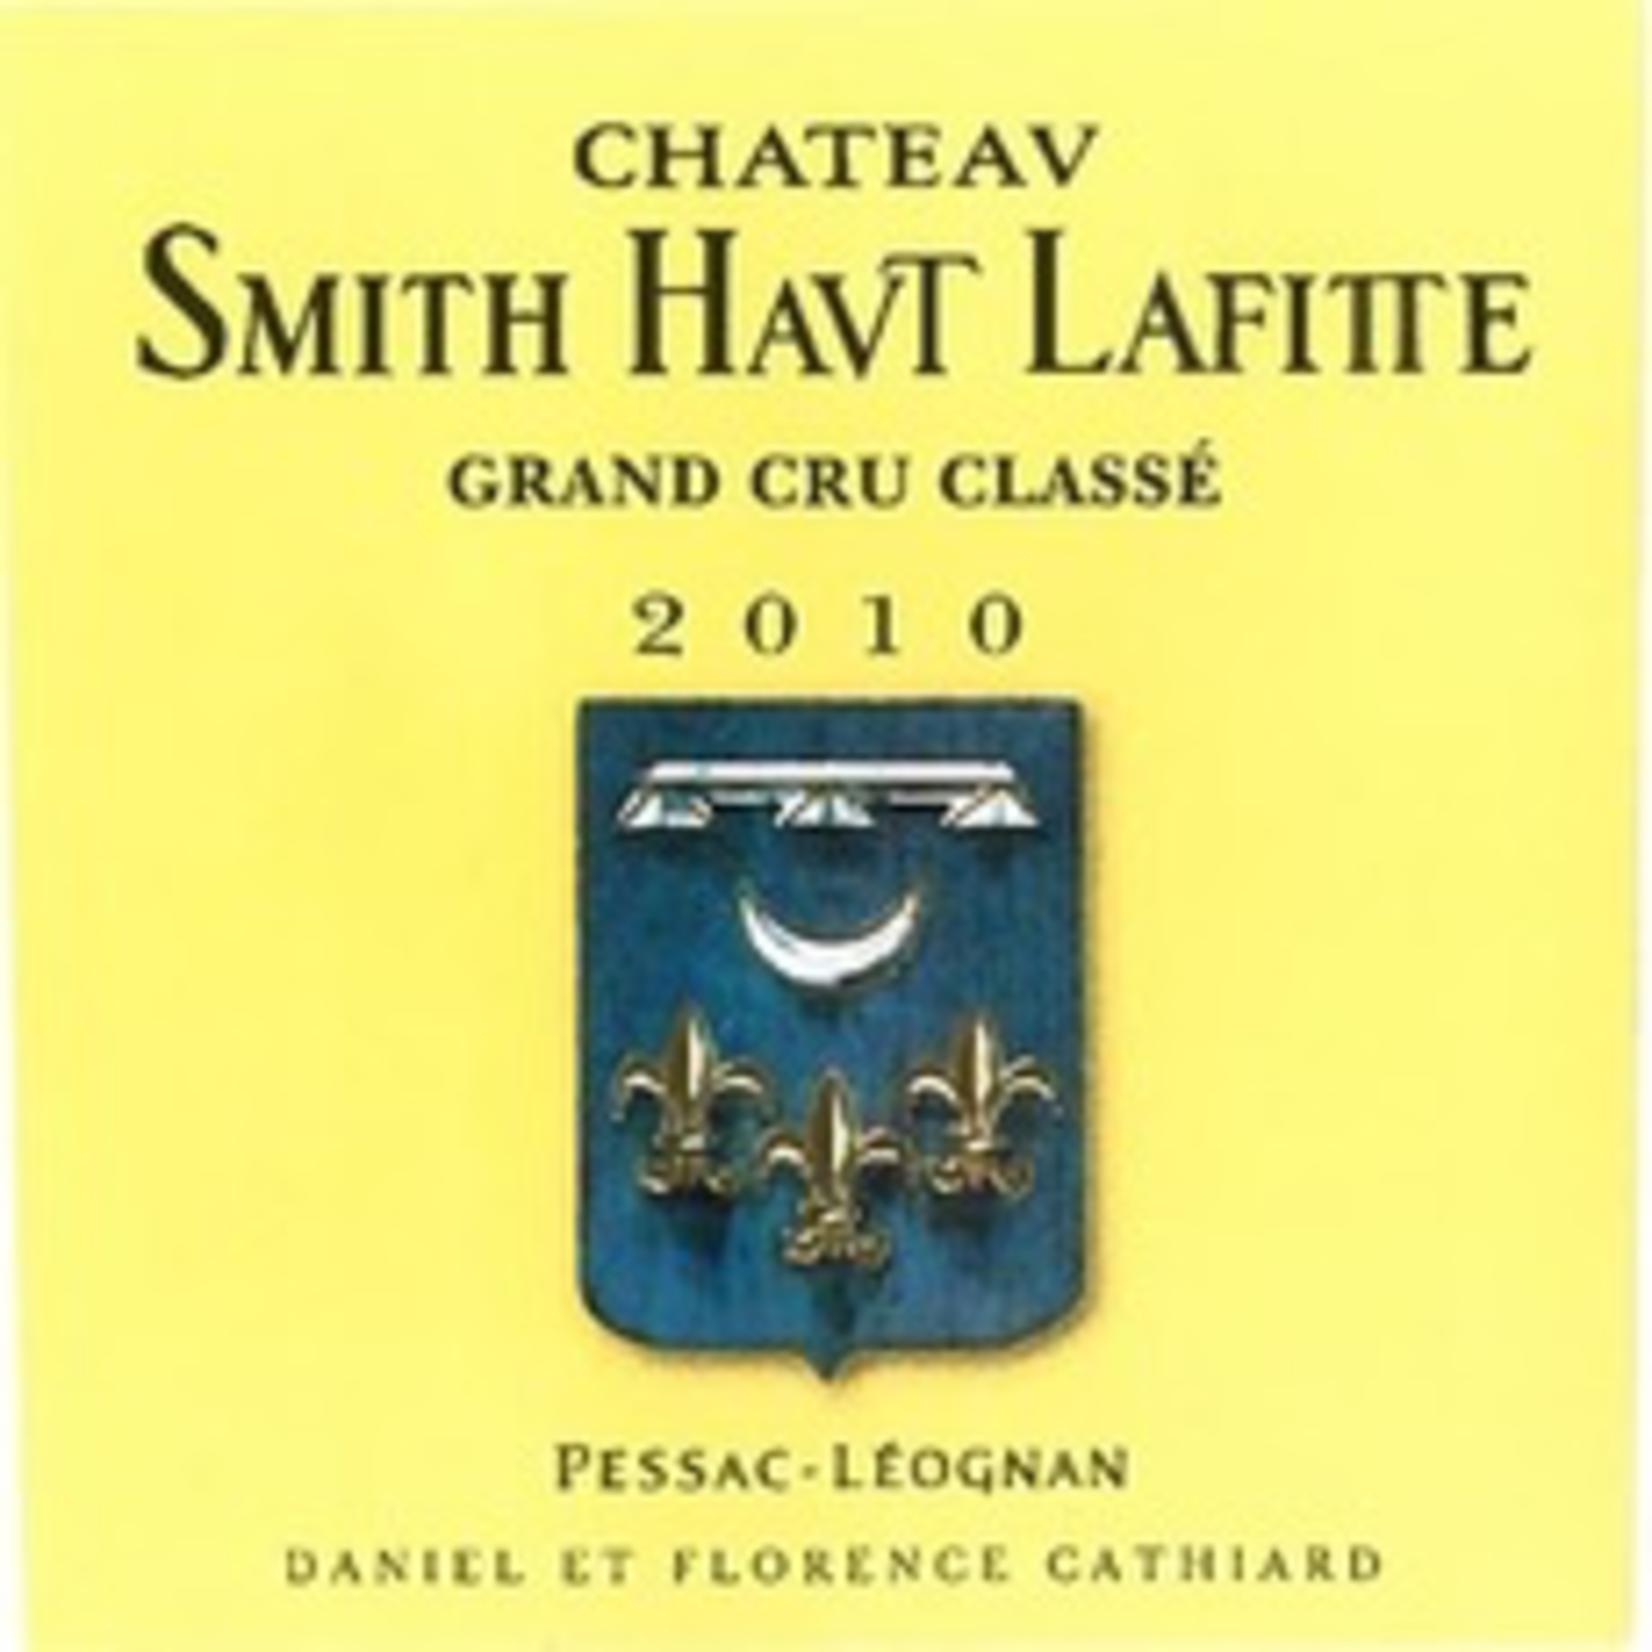 Wine Chateau Smith Haut Lafitte 2010